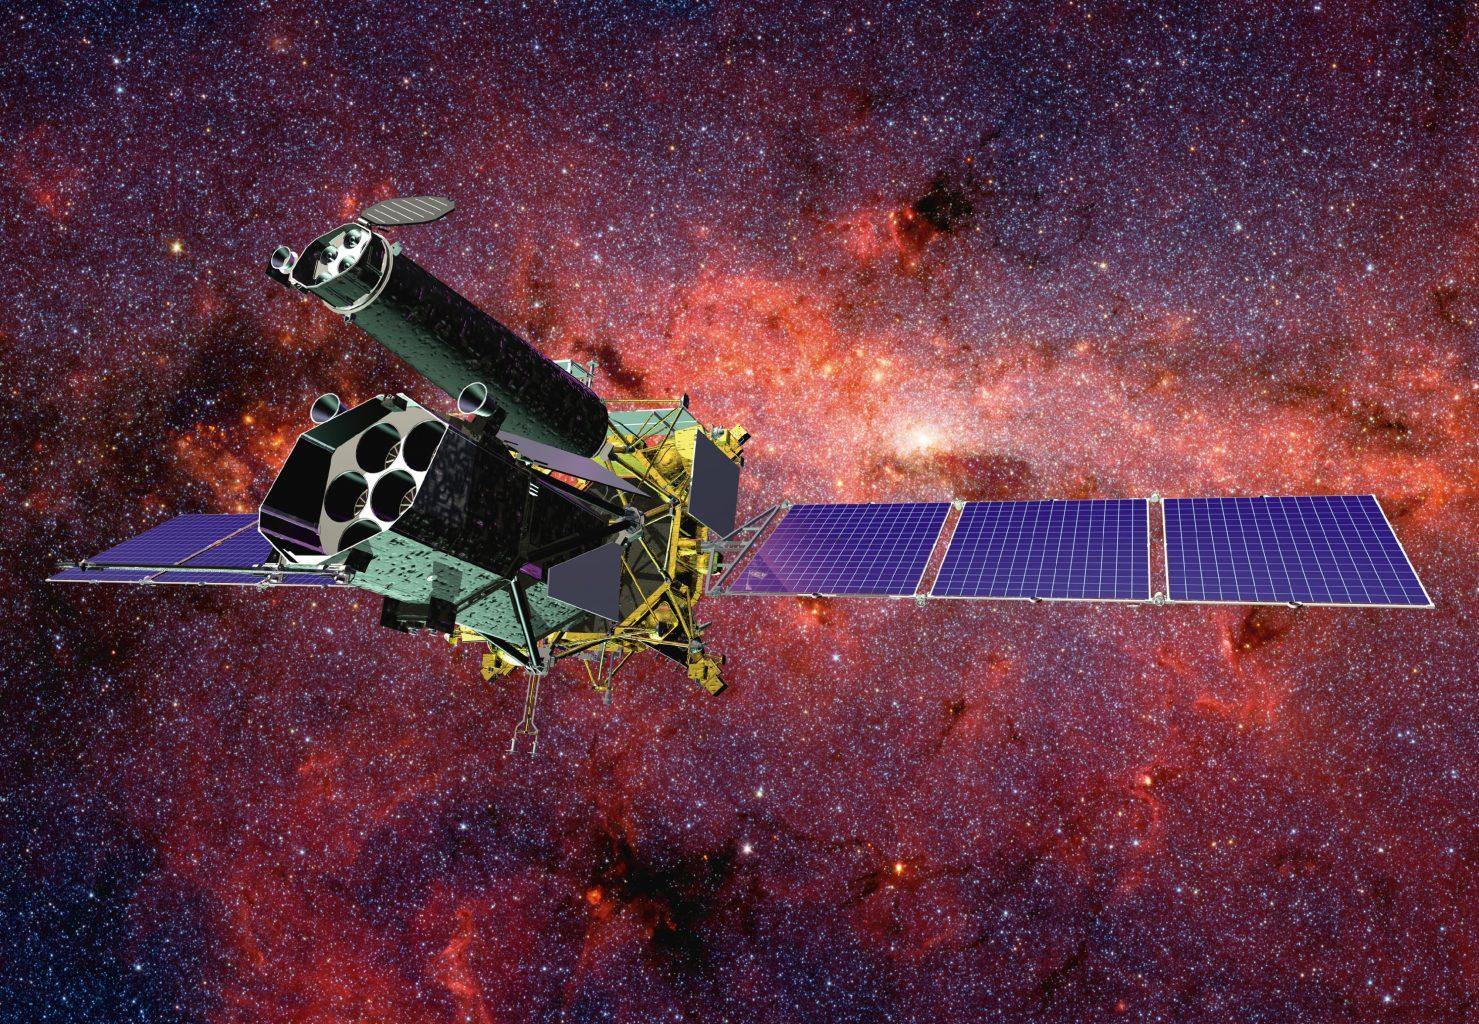 Artist's impression of Spektr-RG in space. Credit: JSC